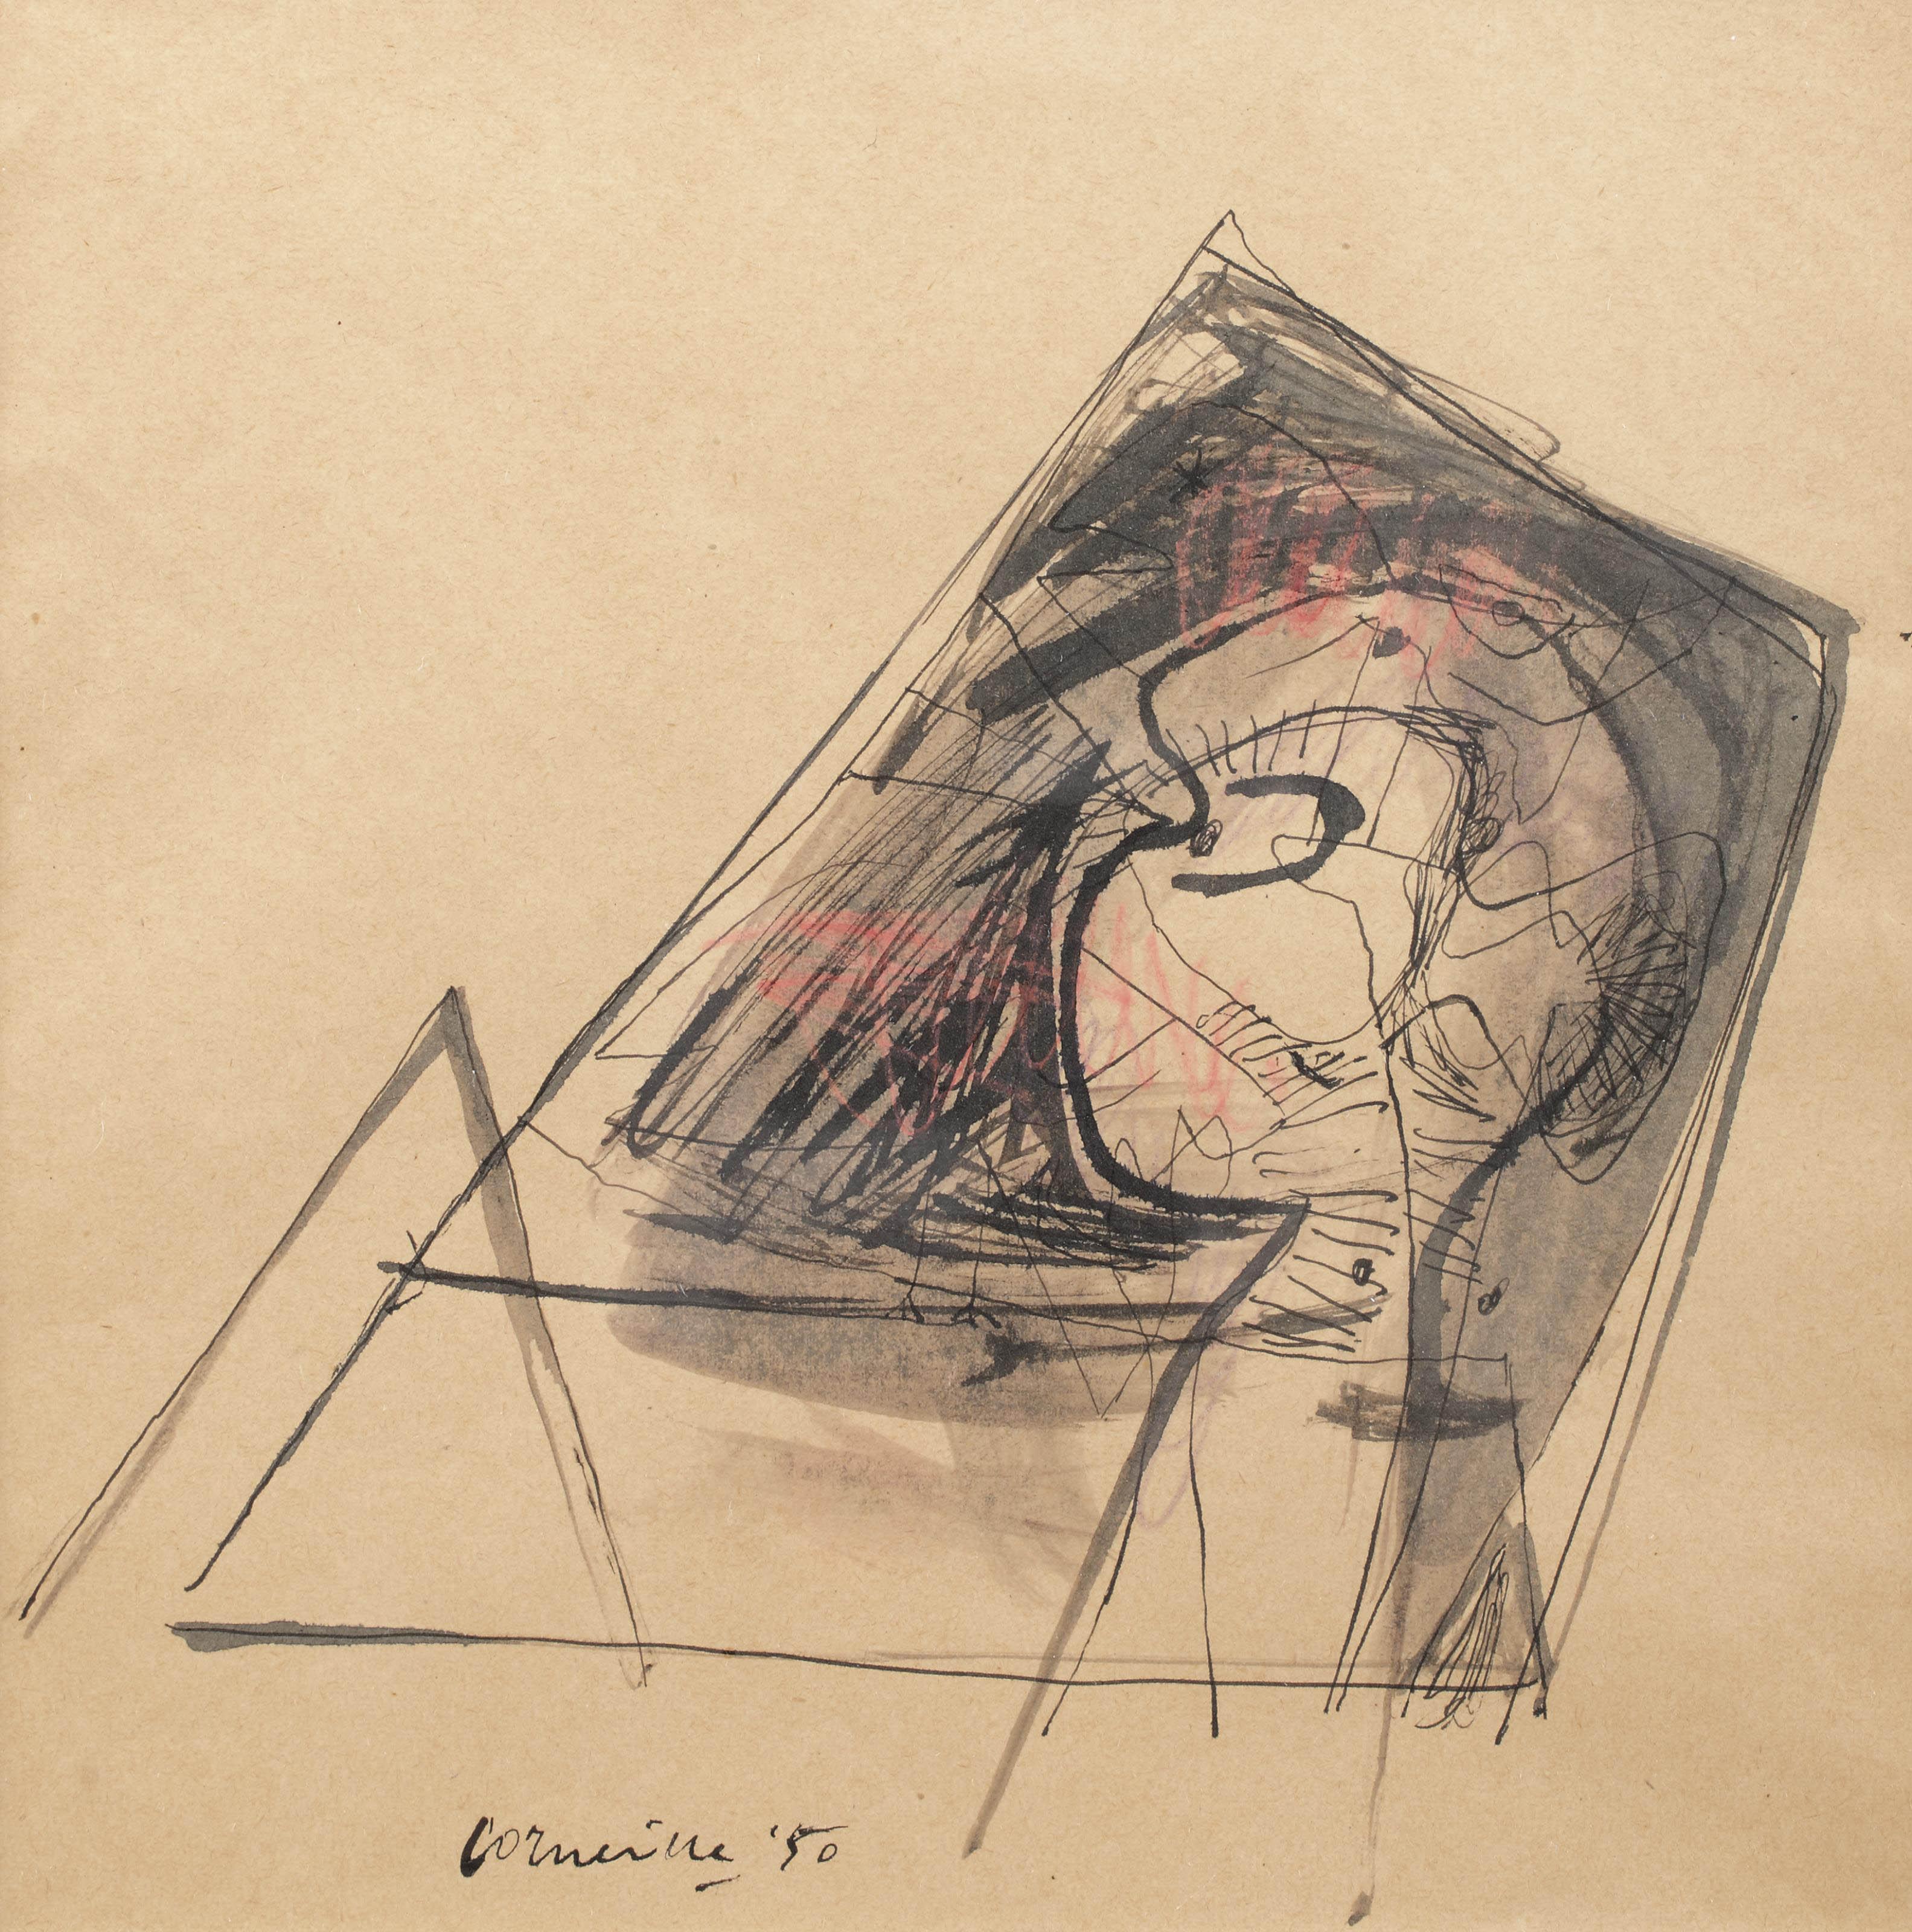 Corneille (1922-2010)